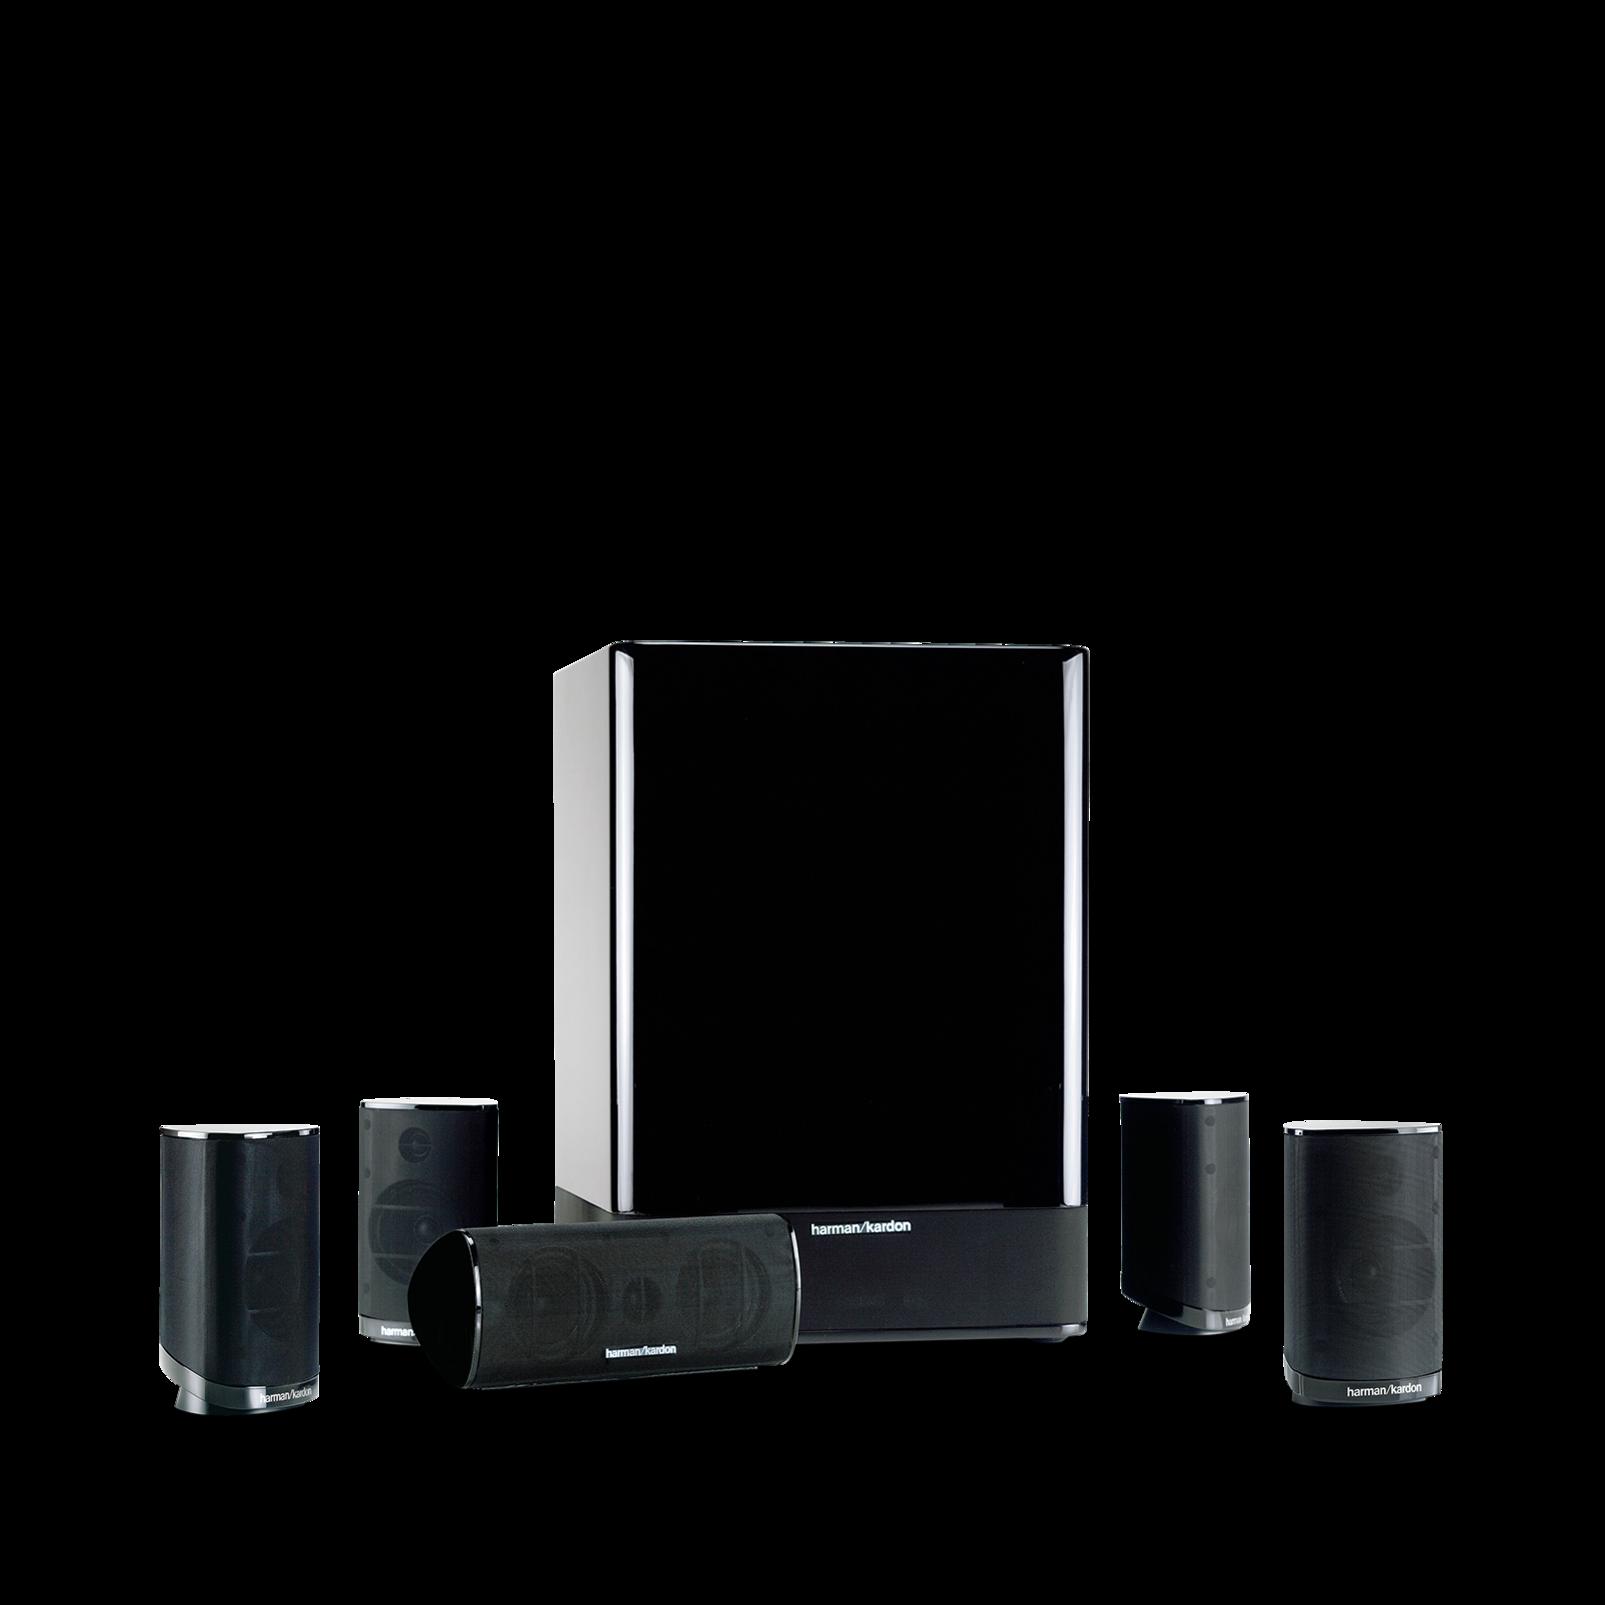 Harman Kardon HKTS 15 5.1 Home Theater Speaker System $200 + Free Shipping